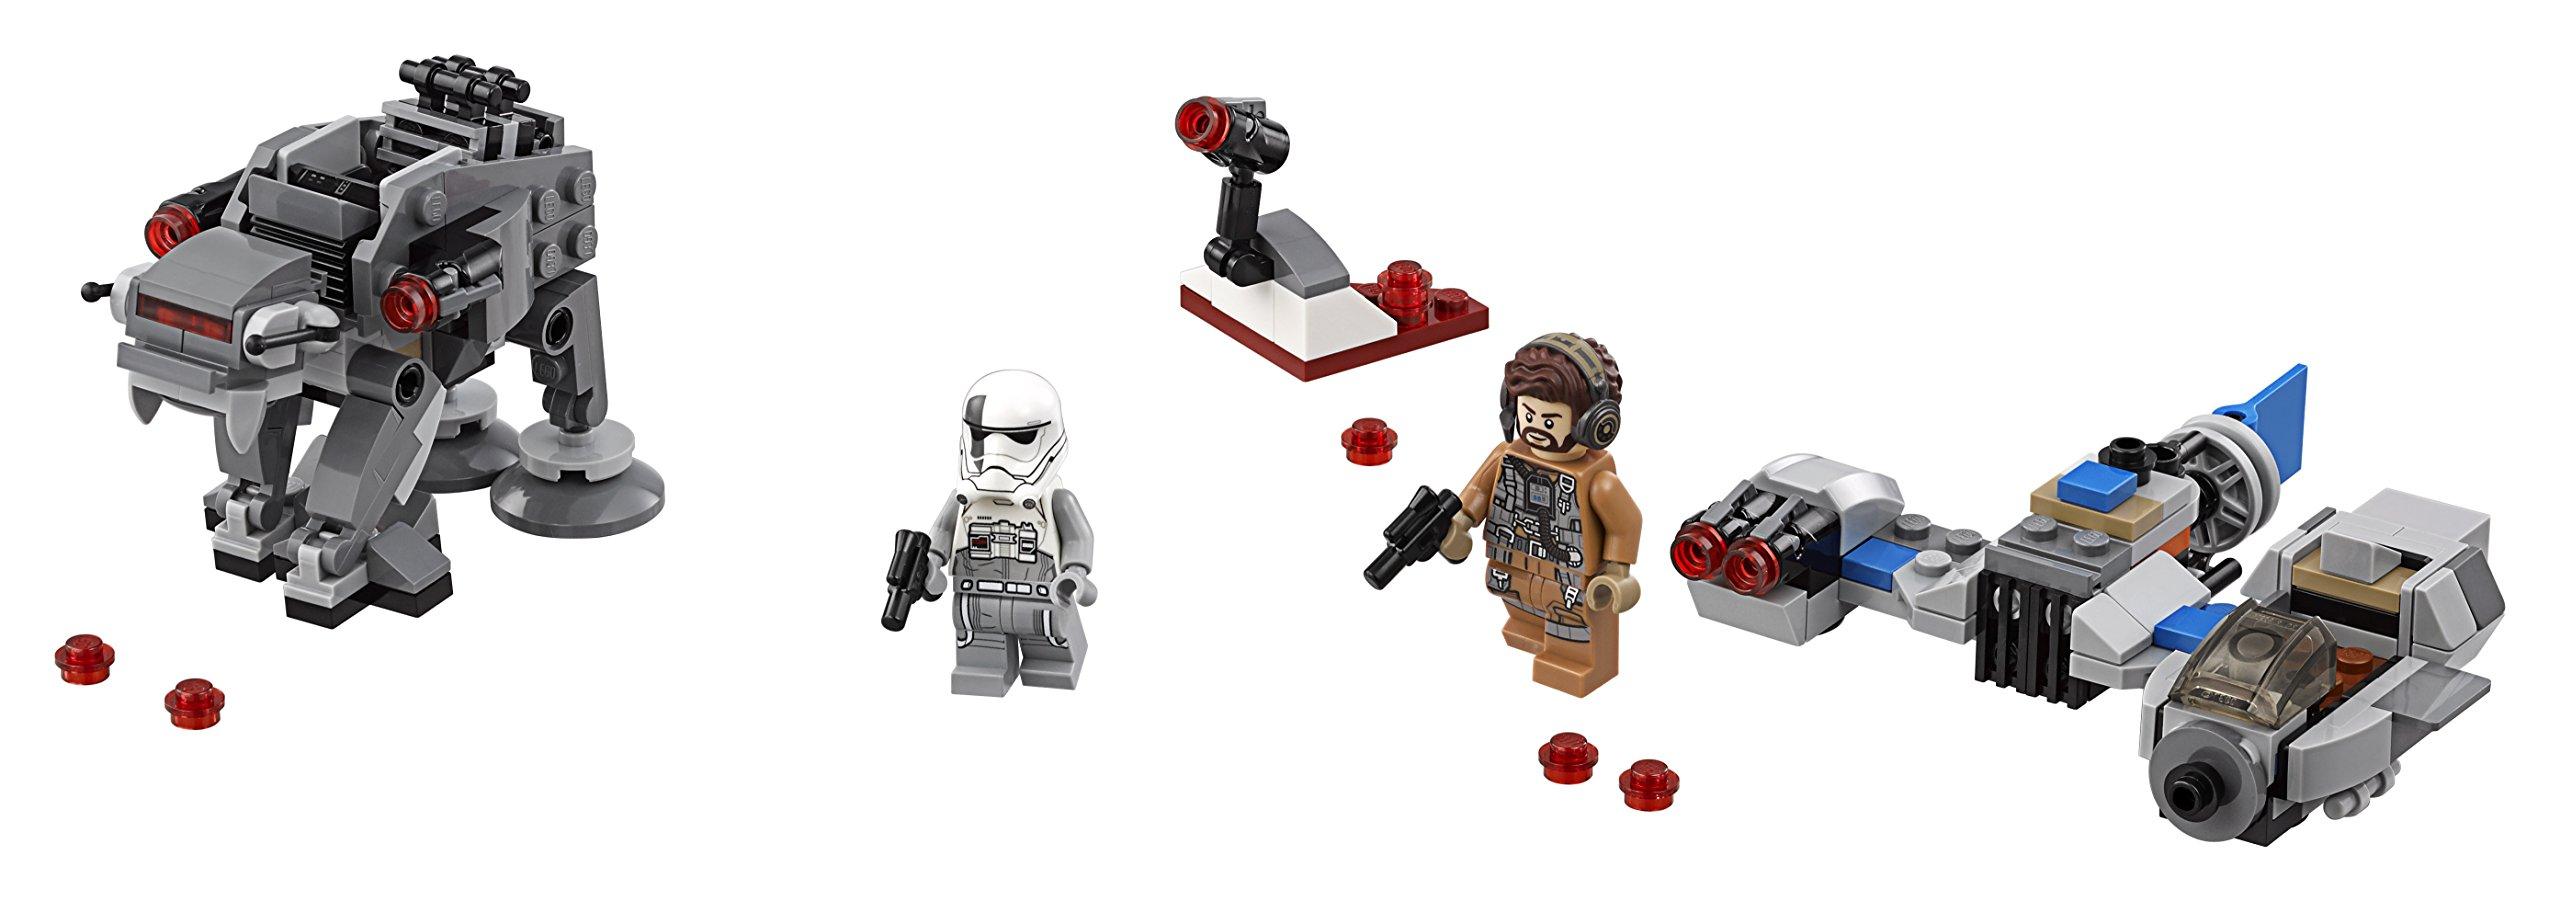 LEGO- Star Wars TMSki Speeder conMicrofighter First Order Walker, Multicolore, 75195 3 spesavip